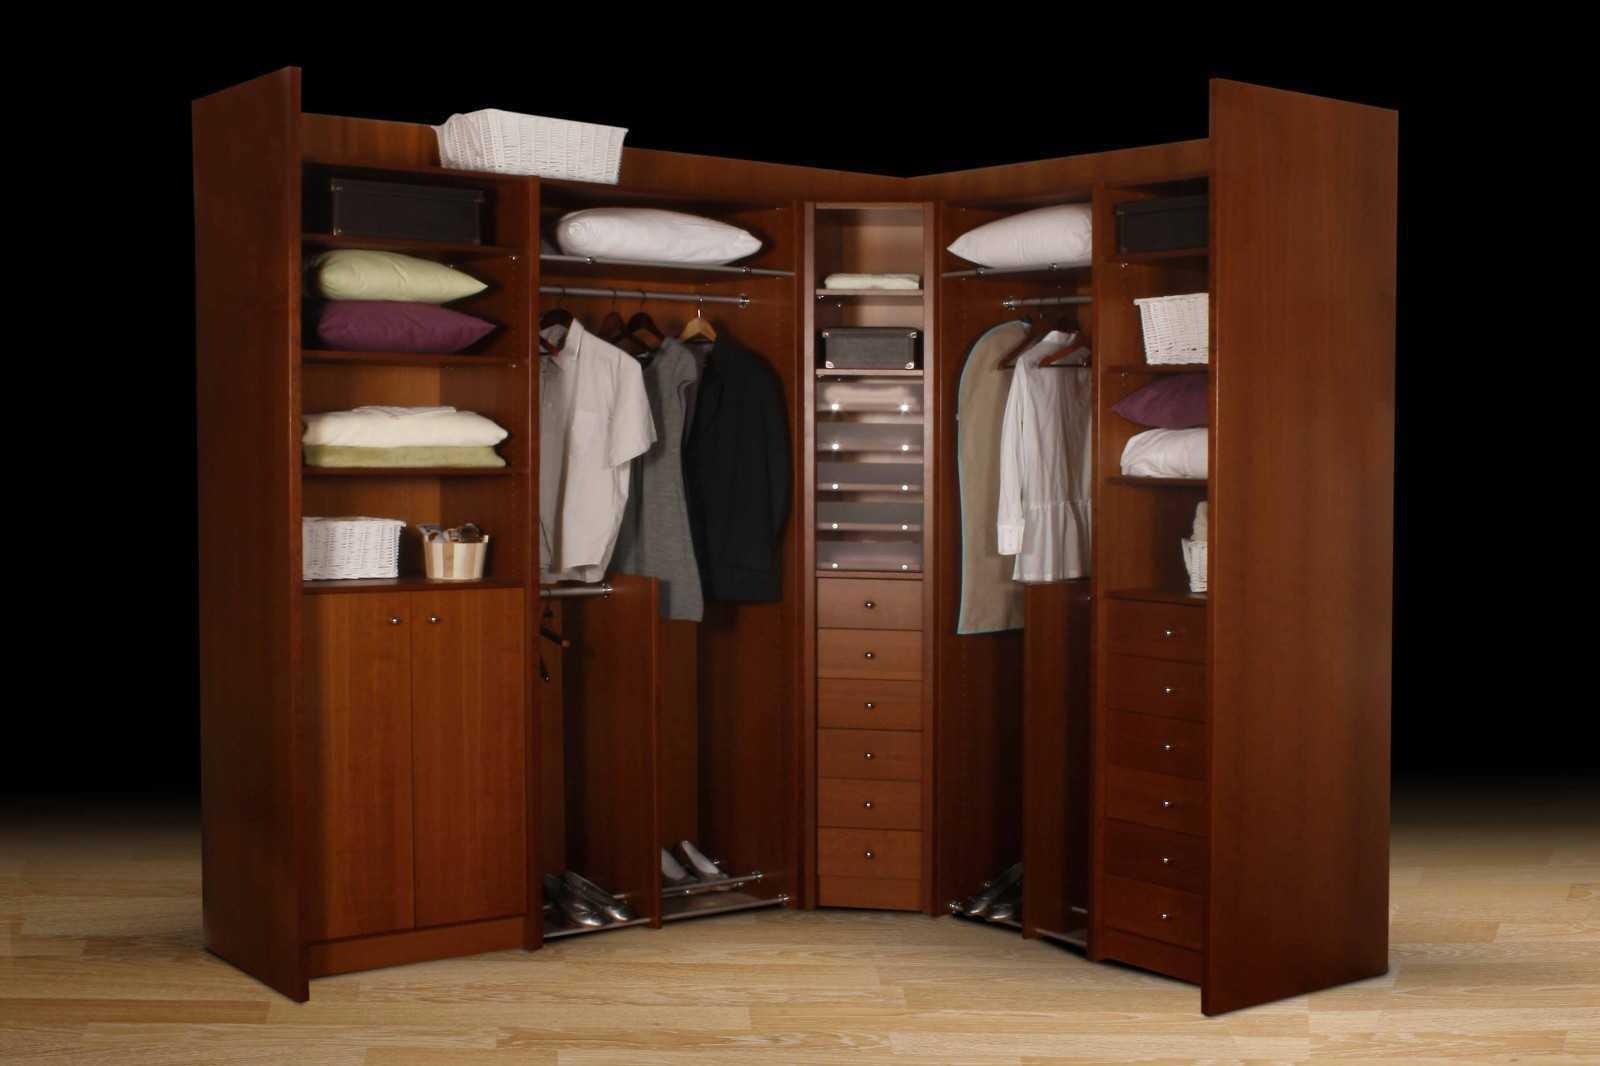 dressing sur mesure queen mary la maison des bibliotheques. Black Bedroom Furniture Sets. Home Design Ideas